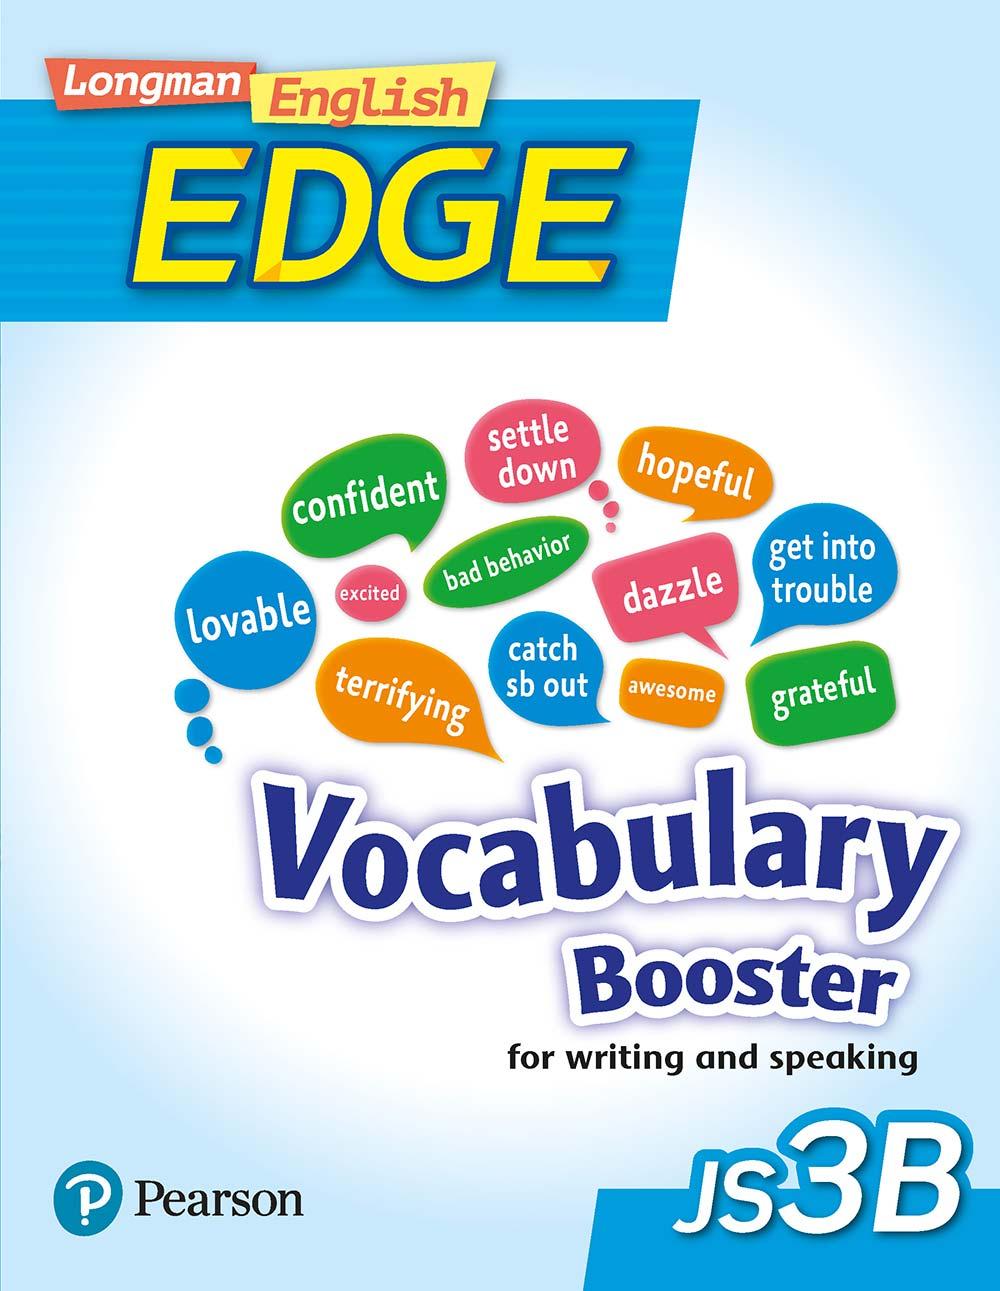 Longman English Edge JS3B Vocabulary Booster